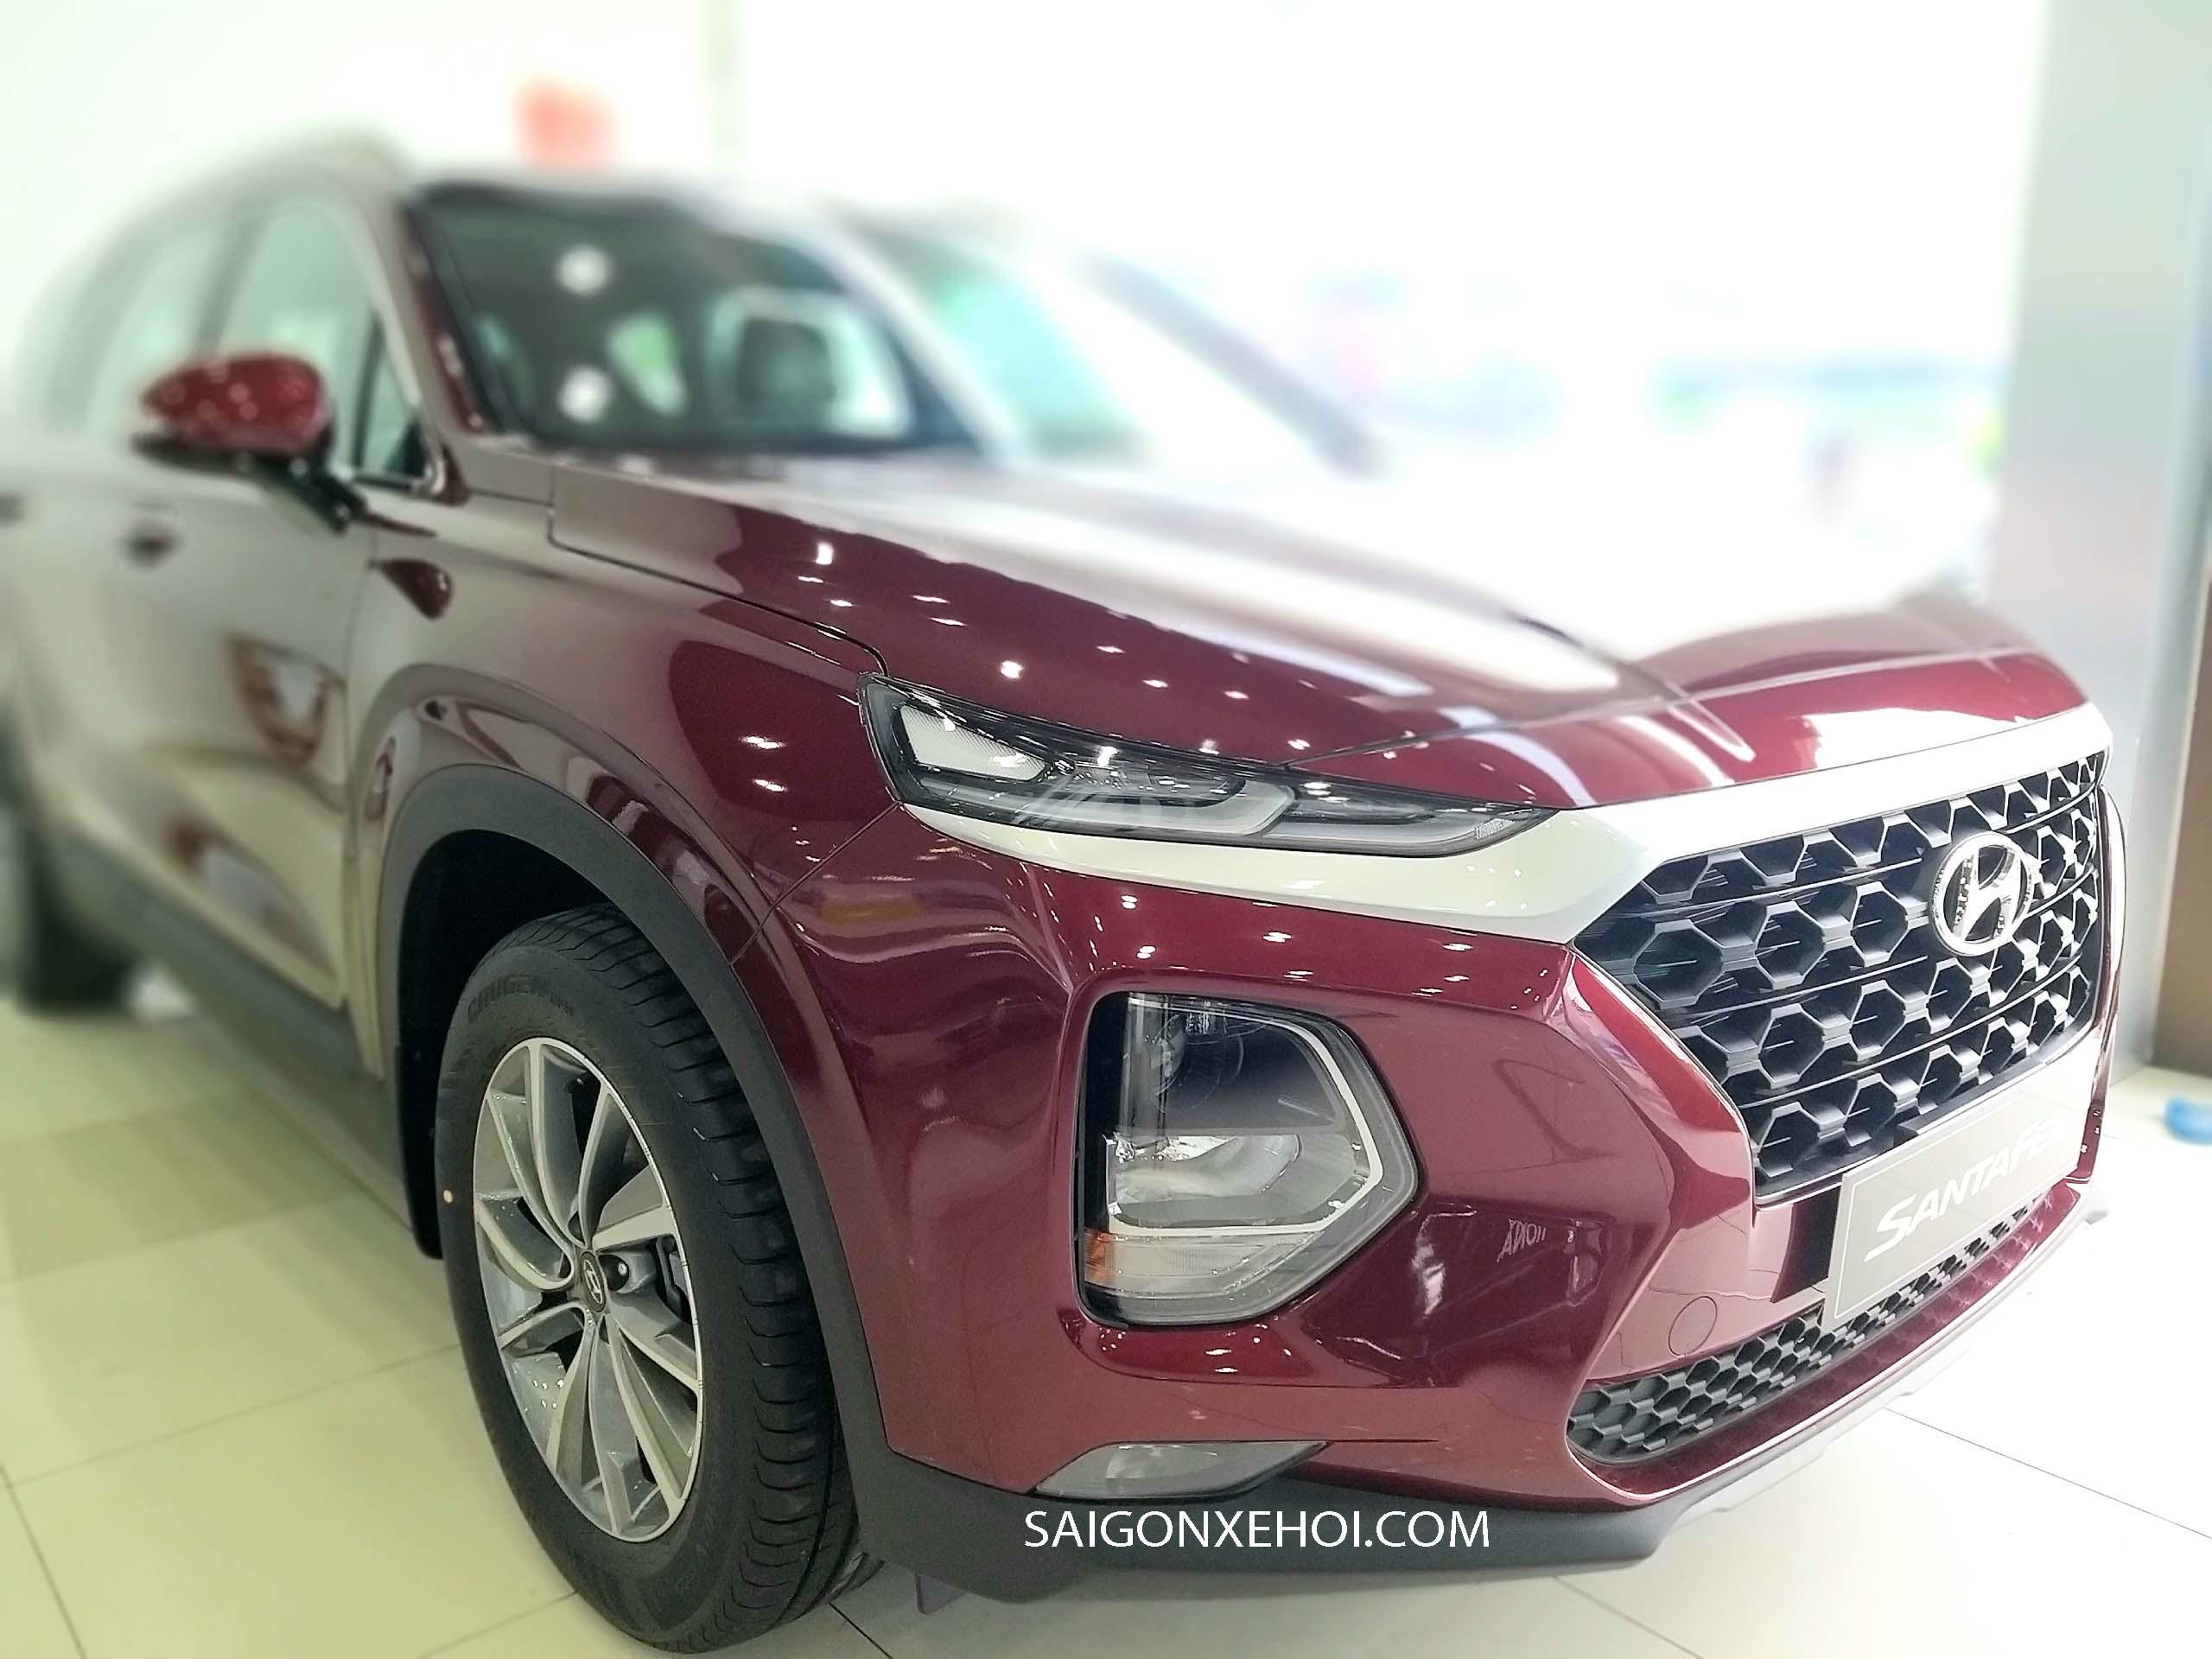 Thiết kế xe Thân xe Hyundai Santafe 2020